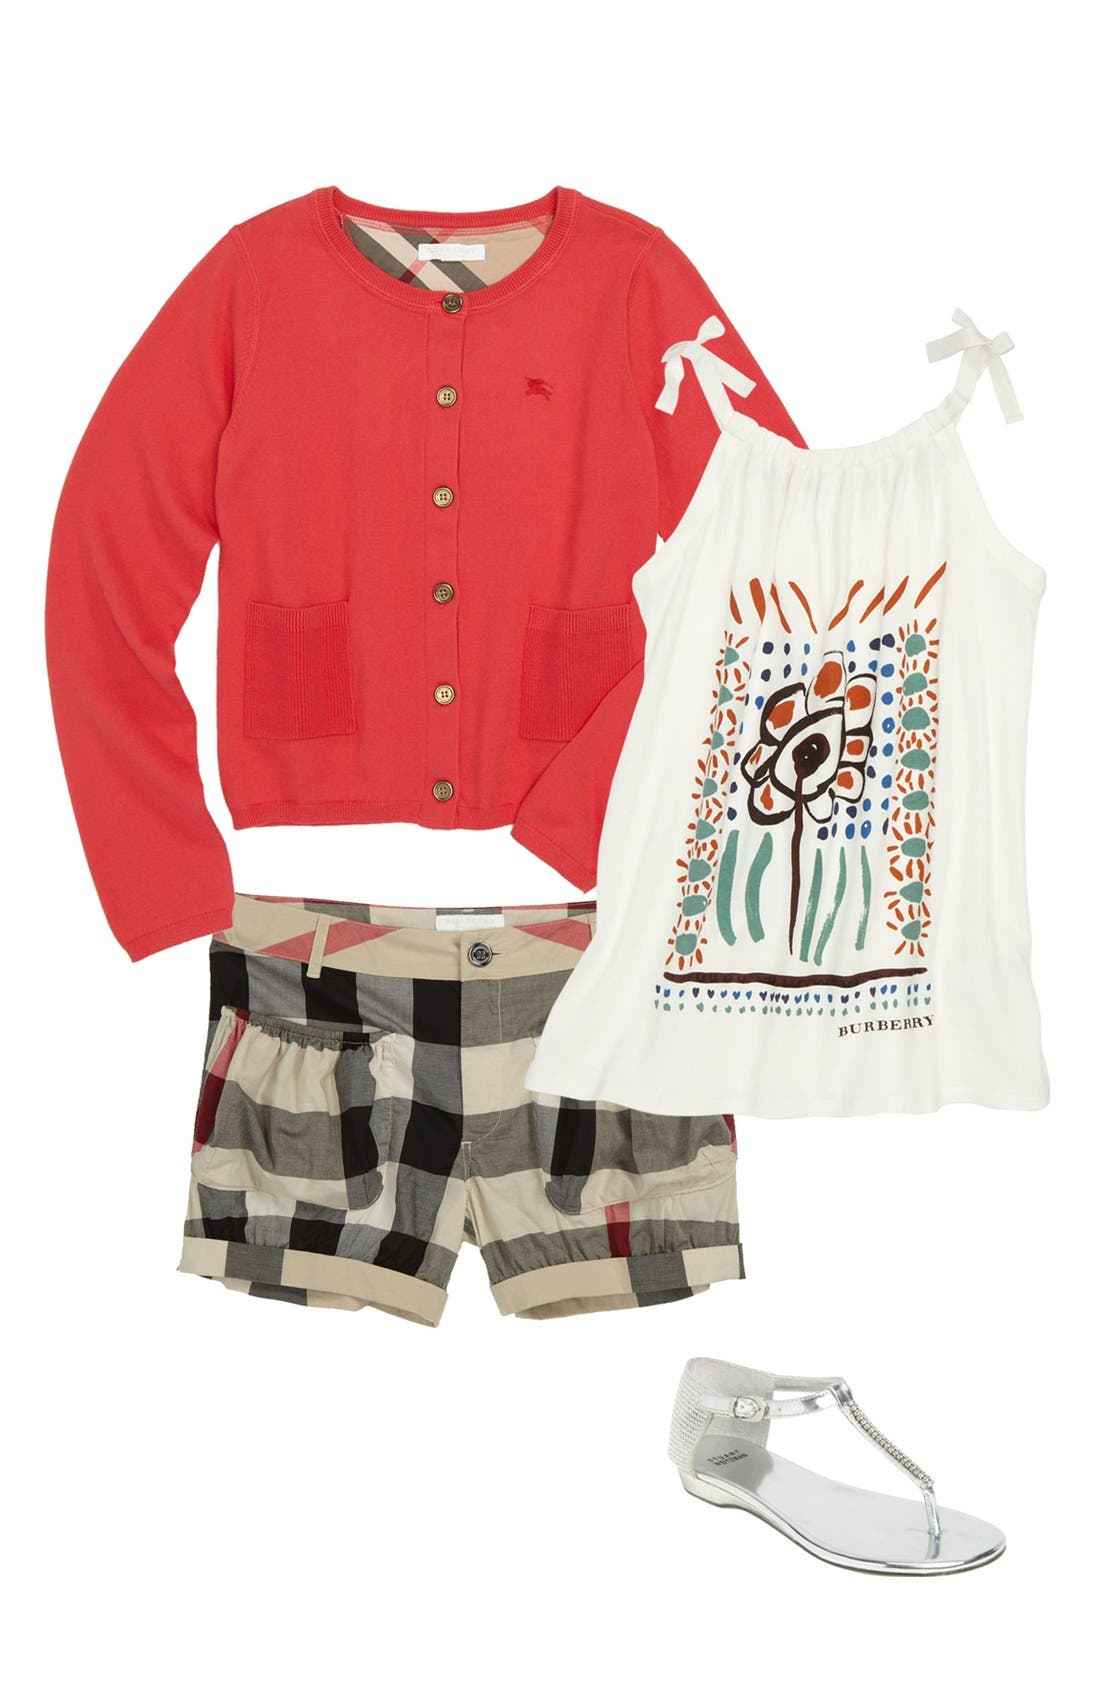 Alternate Image 1 Selected - Burberry Cardigan, Tank Top & Shorts (Little Girls & Big Girls)